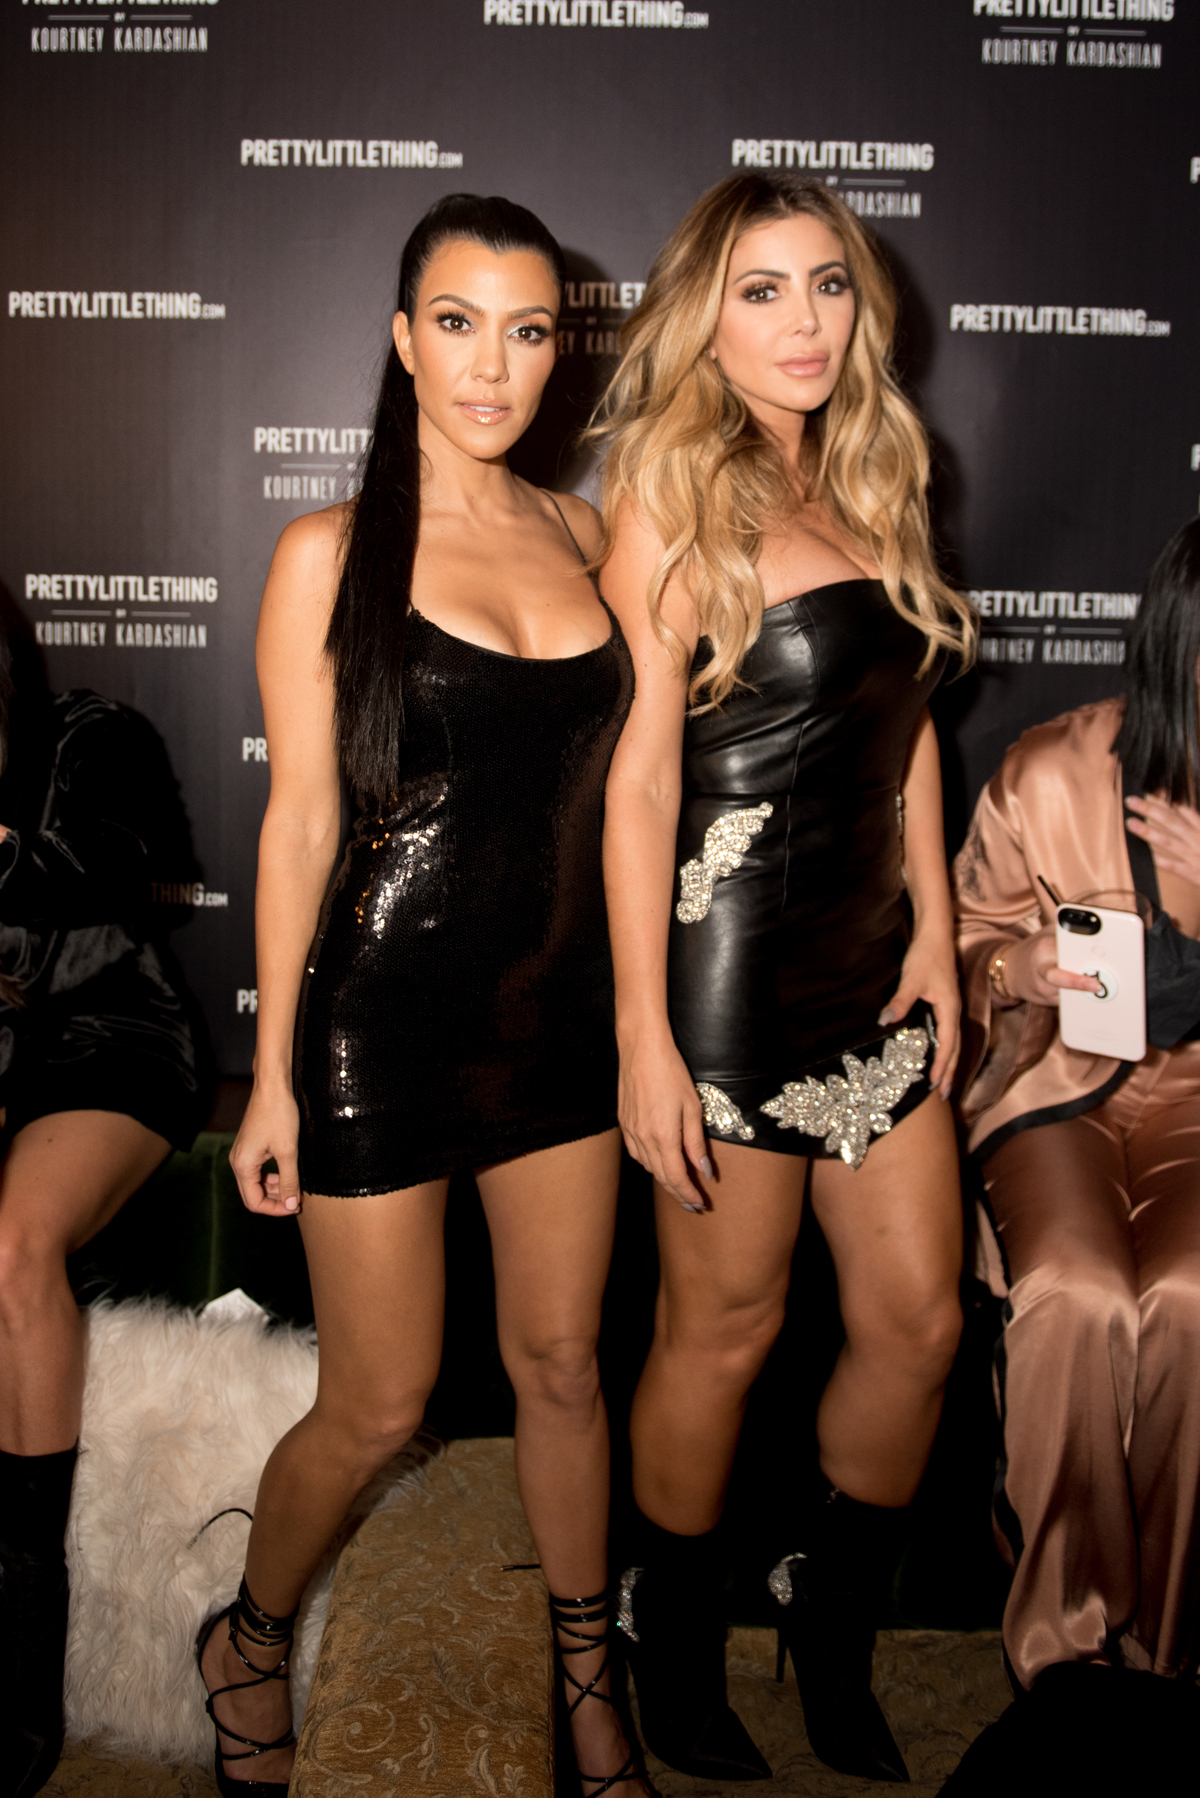 PrettyLittleThing PLT X Kourtney Kardashian Collection Celebrity Launch Party Kourtney and friend.jpg